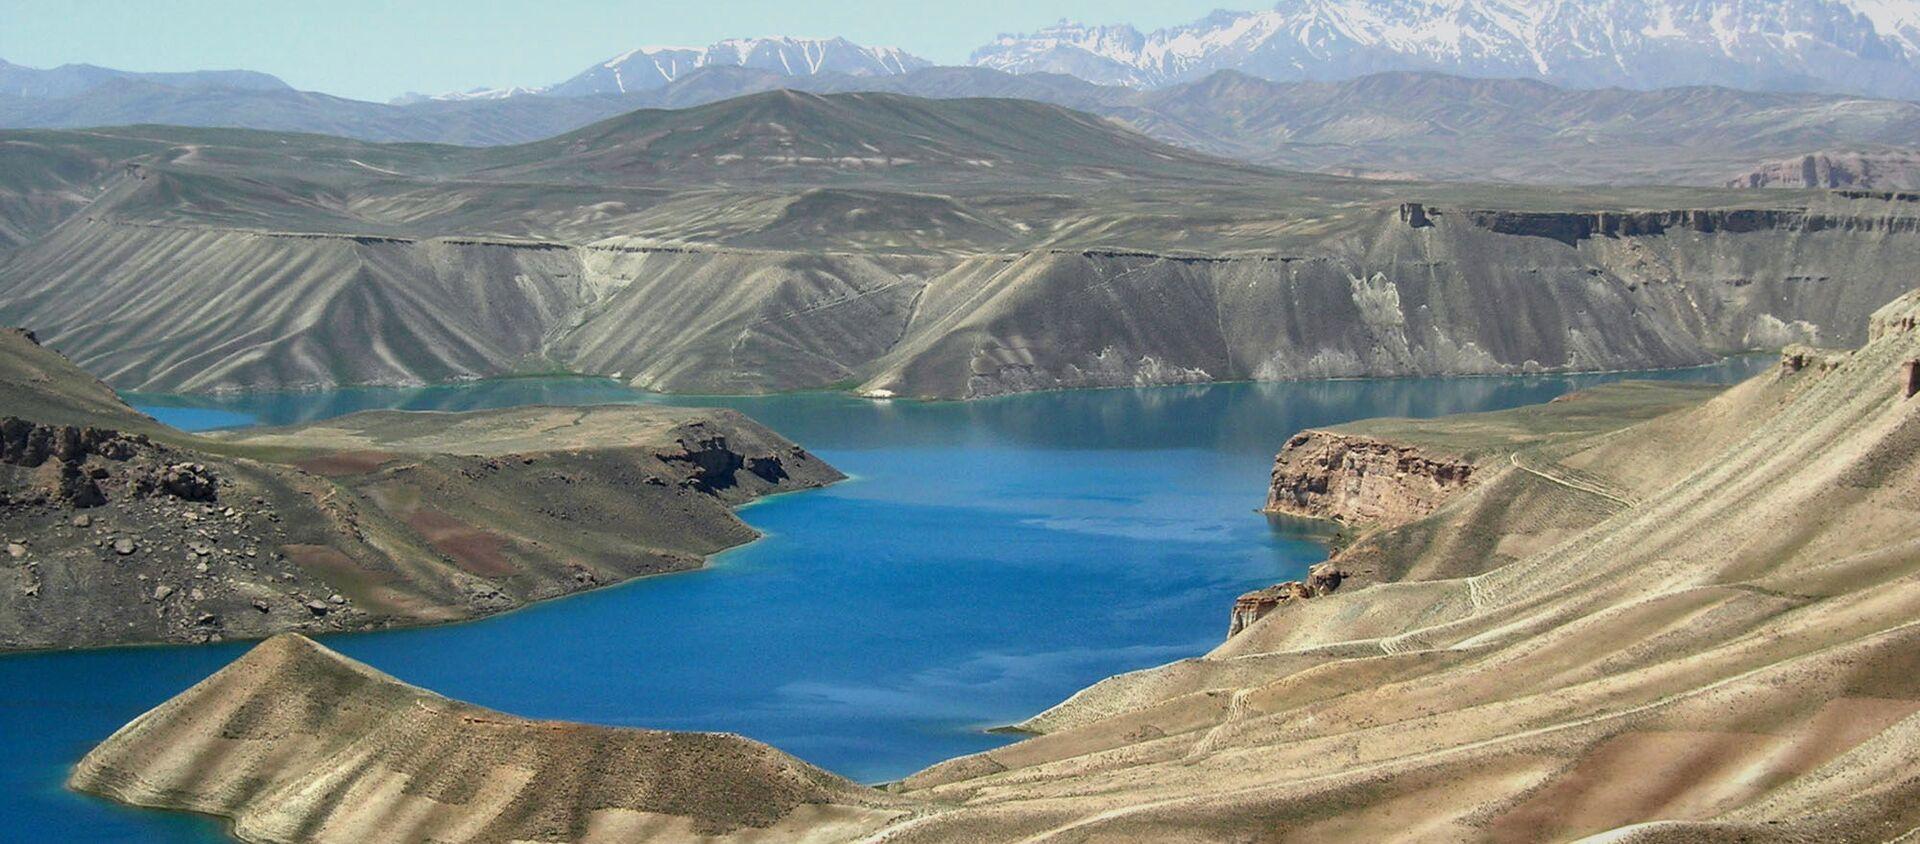 Банд-э-Амир в провинции Бамиан в Афганистане - Sputnik Абхазия, 1920, 24.08.2021